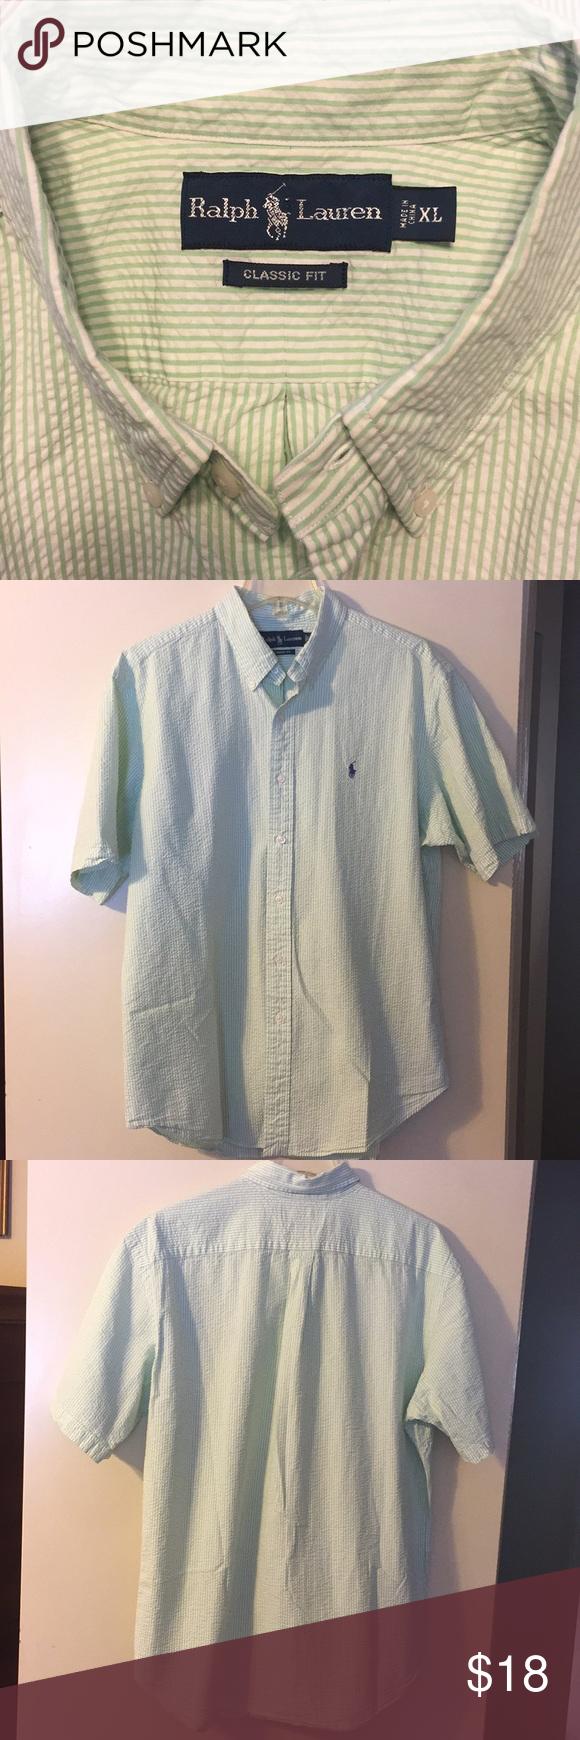 Ralph Lauren Seersucker Shirt This Is A Short Sleeve Ralph Lauren